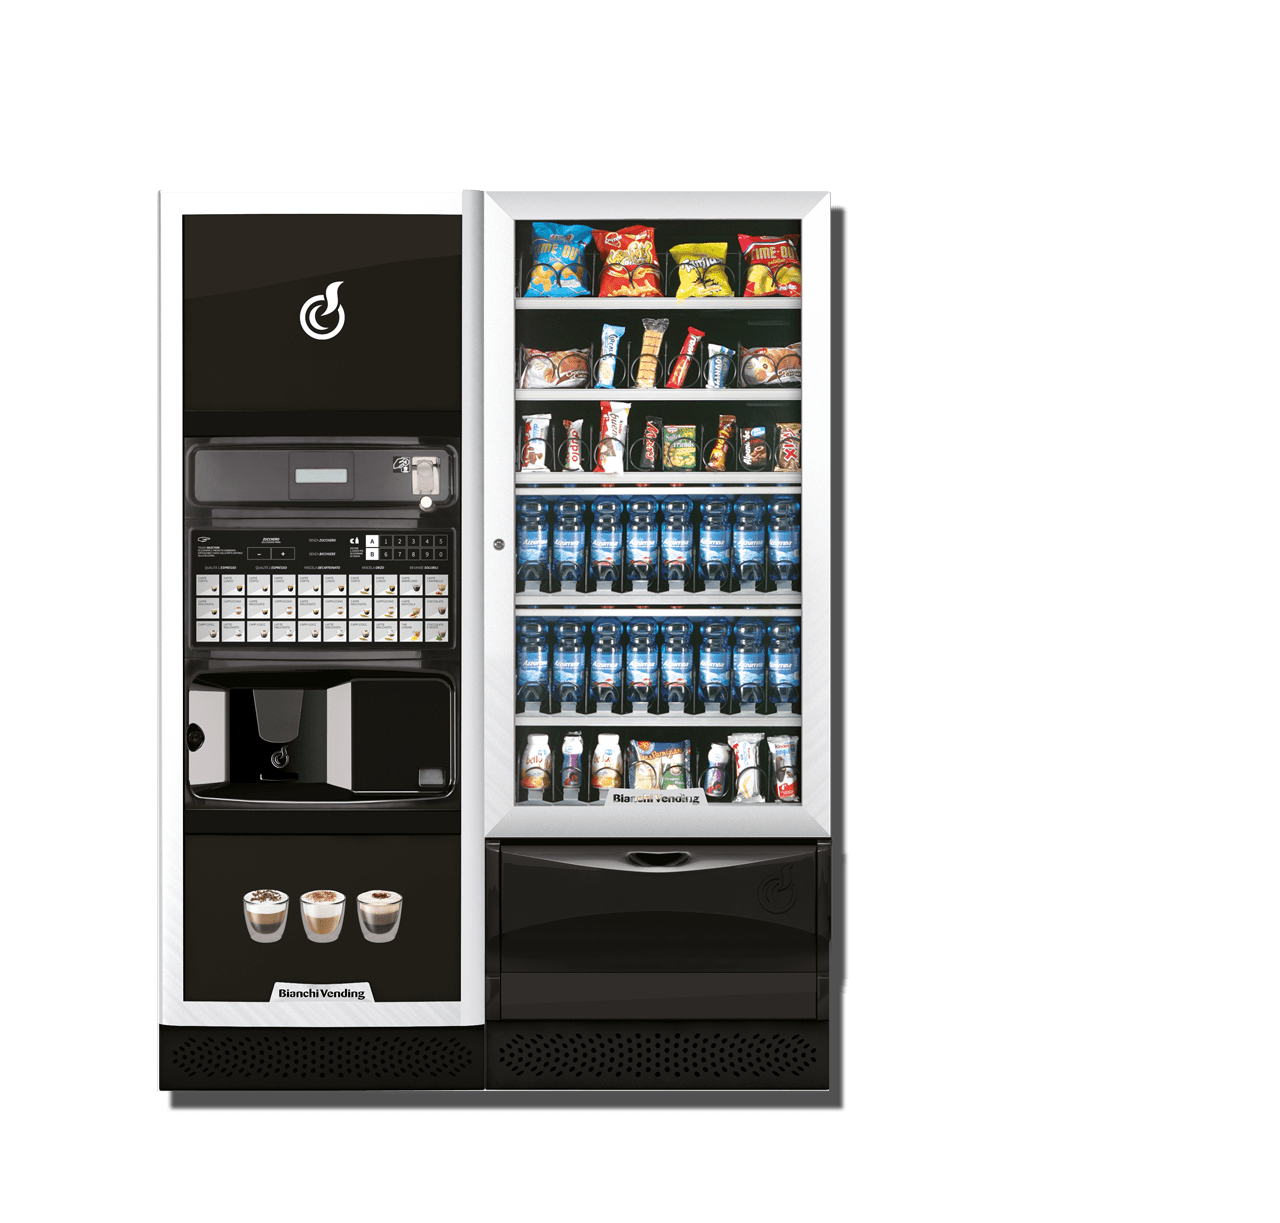 vending-maquinas-de-cafe-y-refrescos2